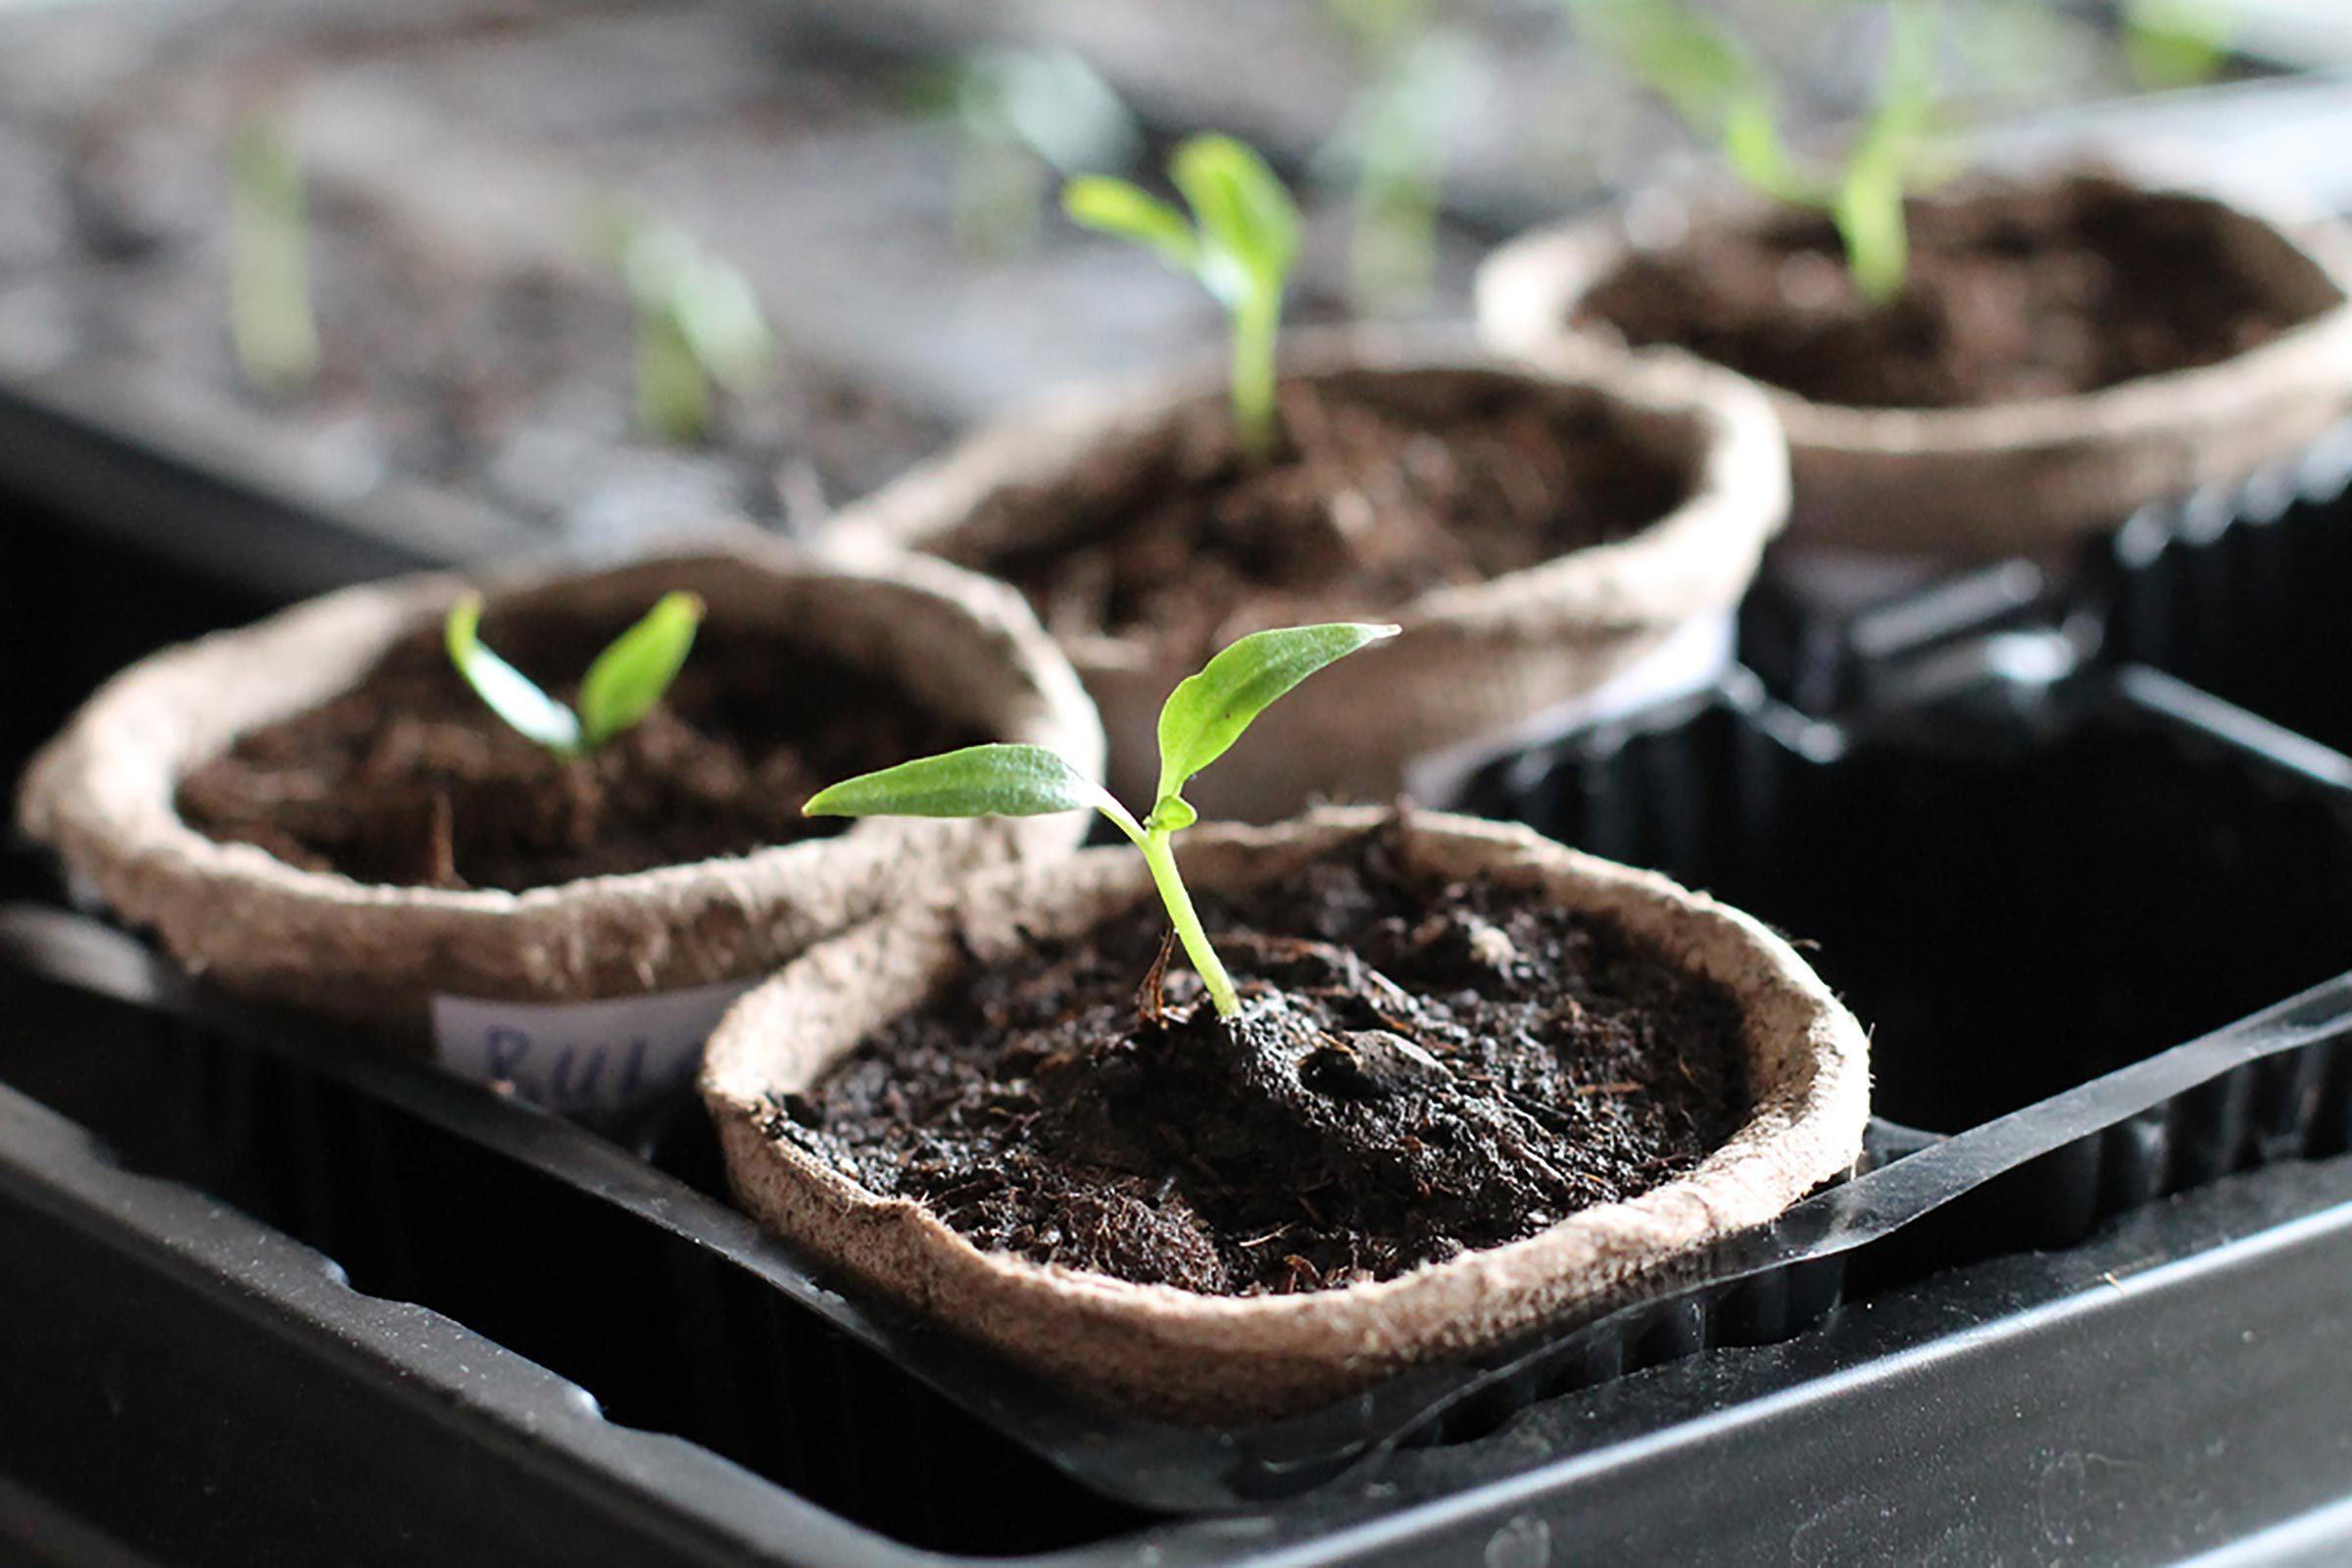 seedlings in tiny pots